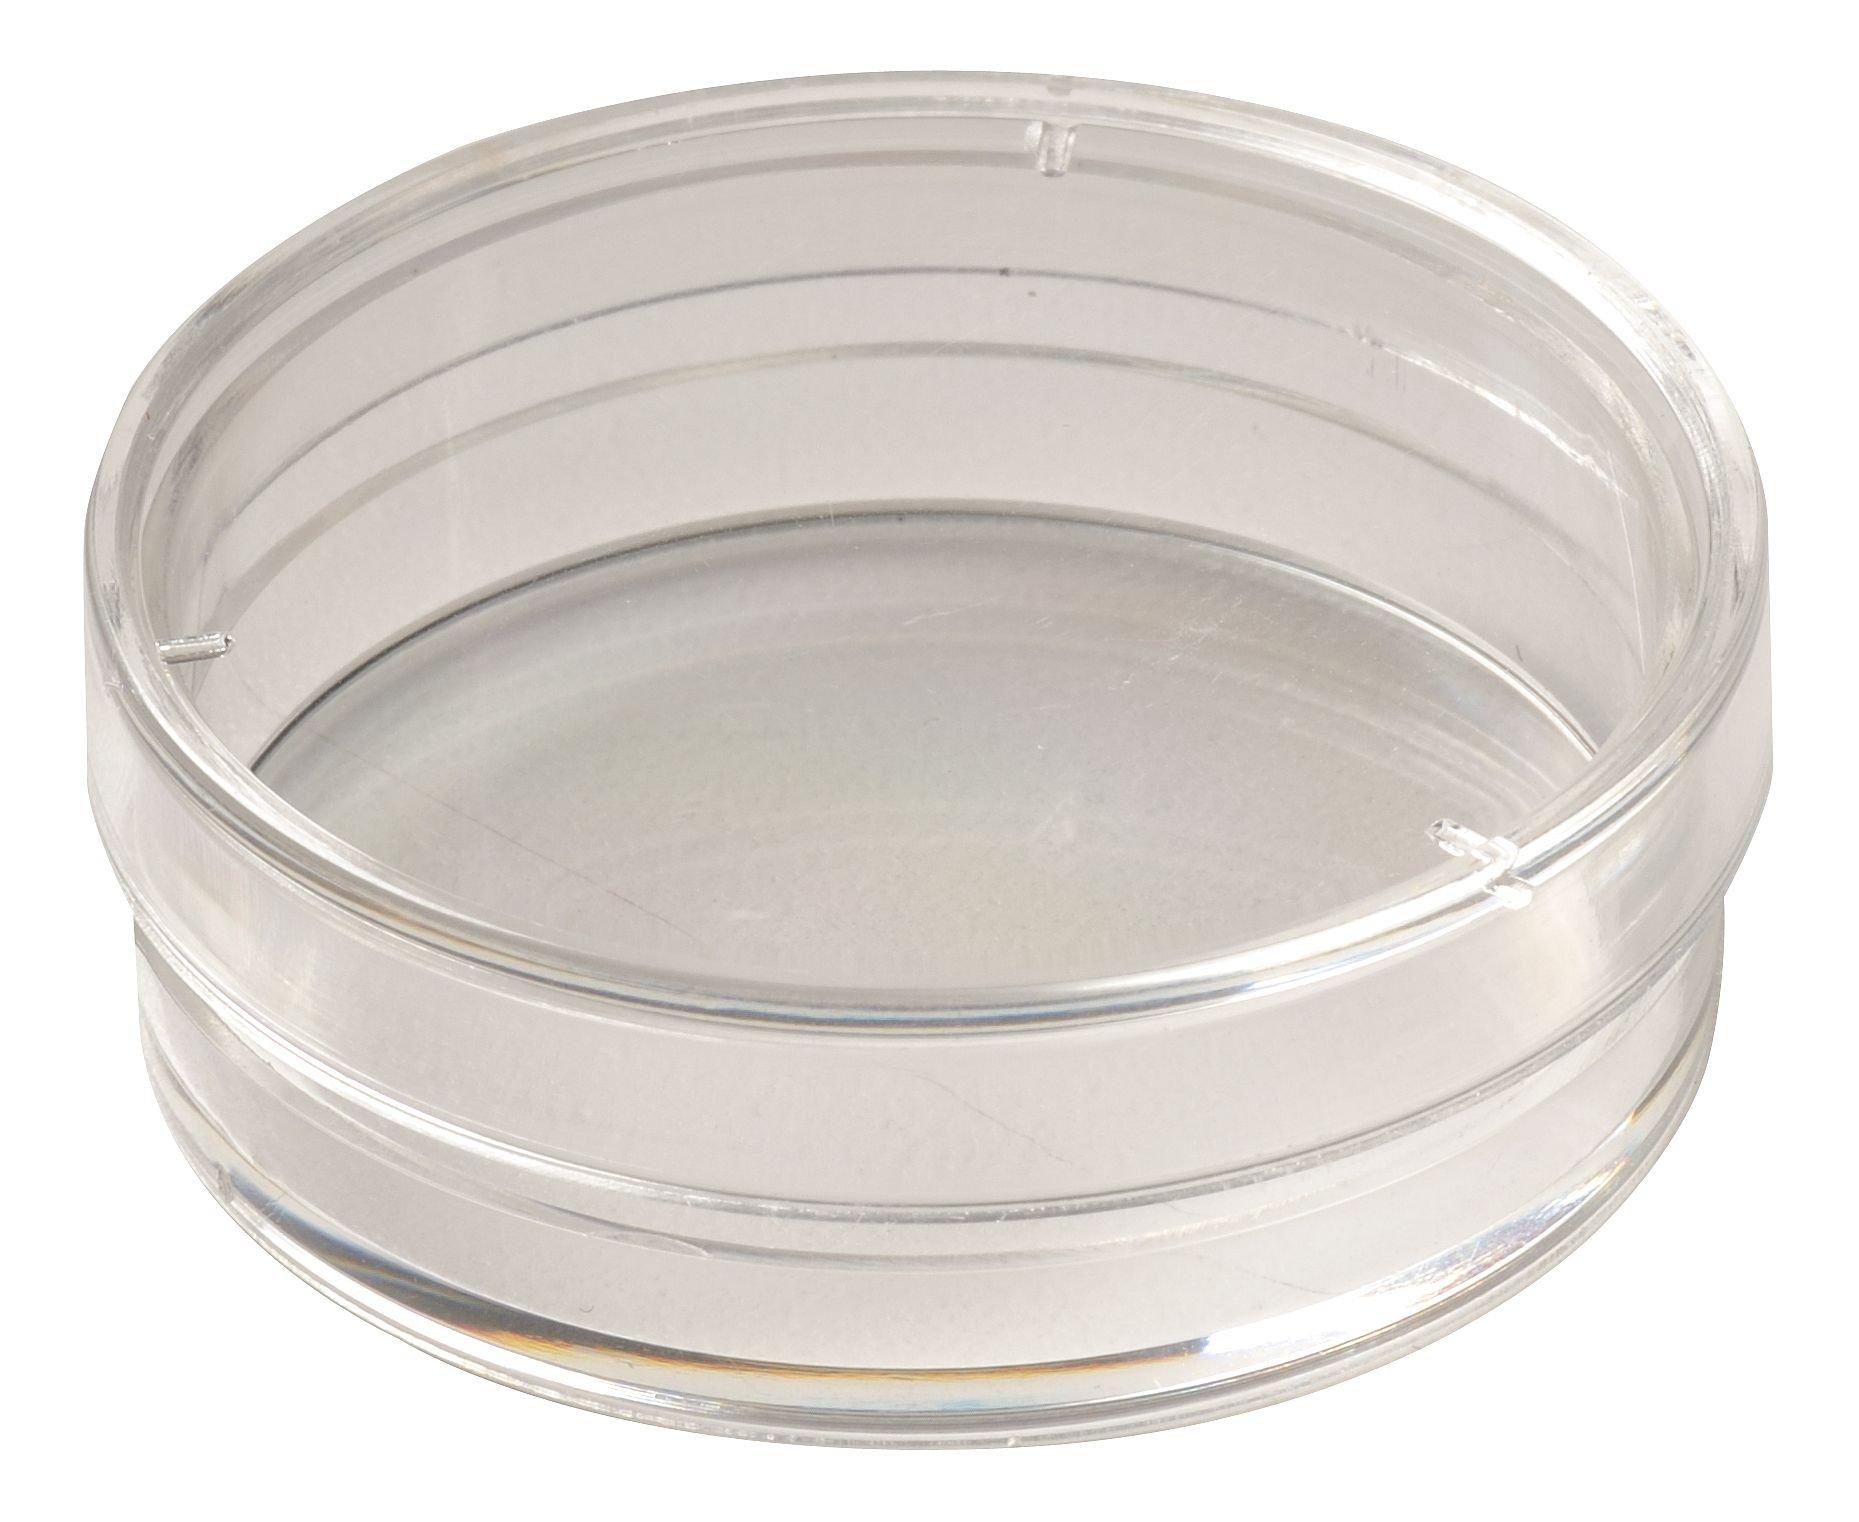 Celltreat 229638 Non-Treated Petri Dish, Sterile, 5mL Working Volume (Case of 960)